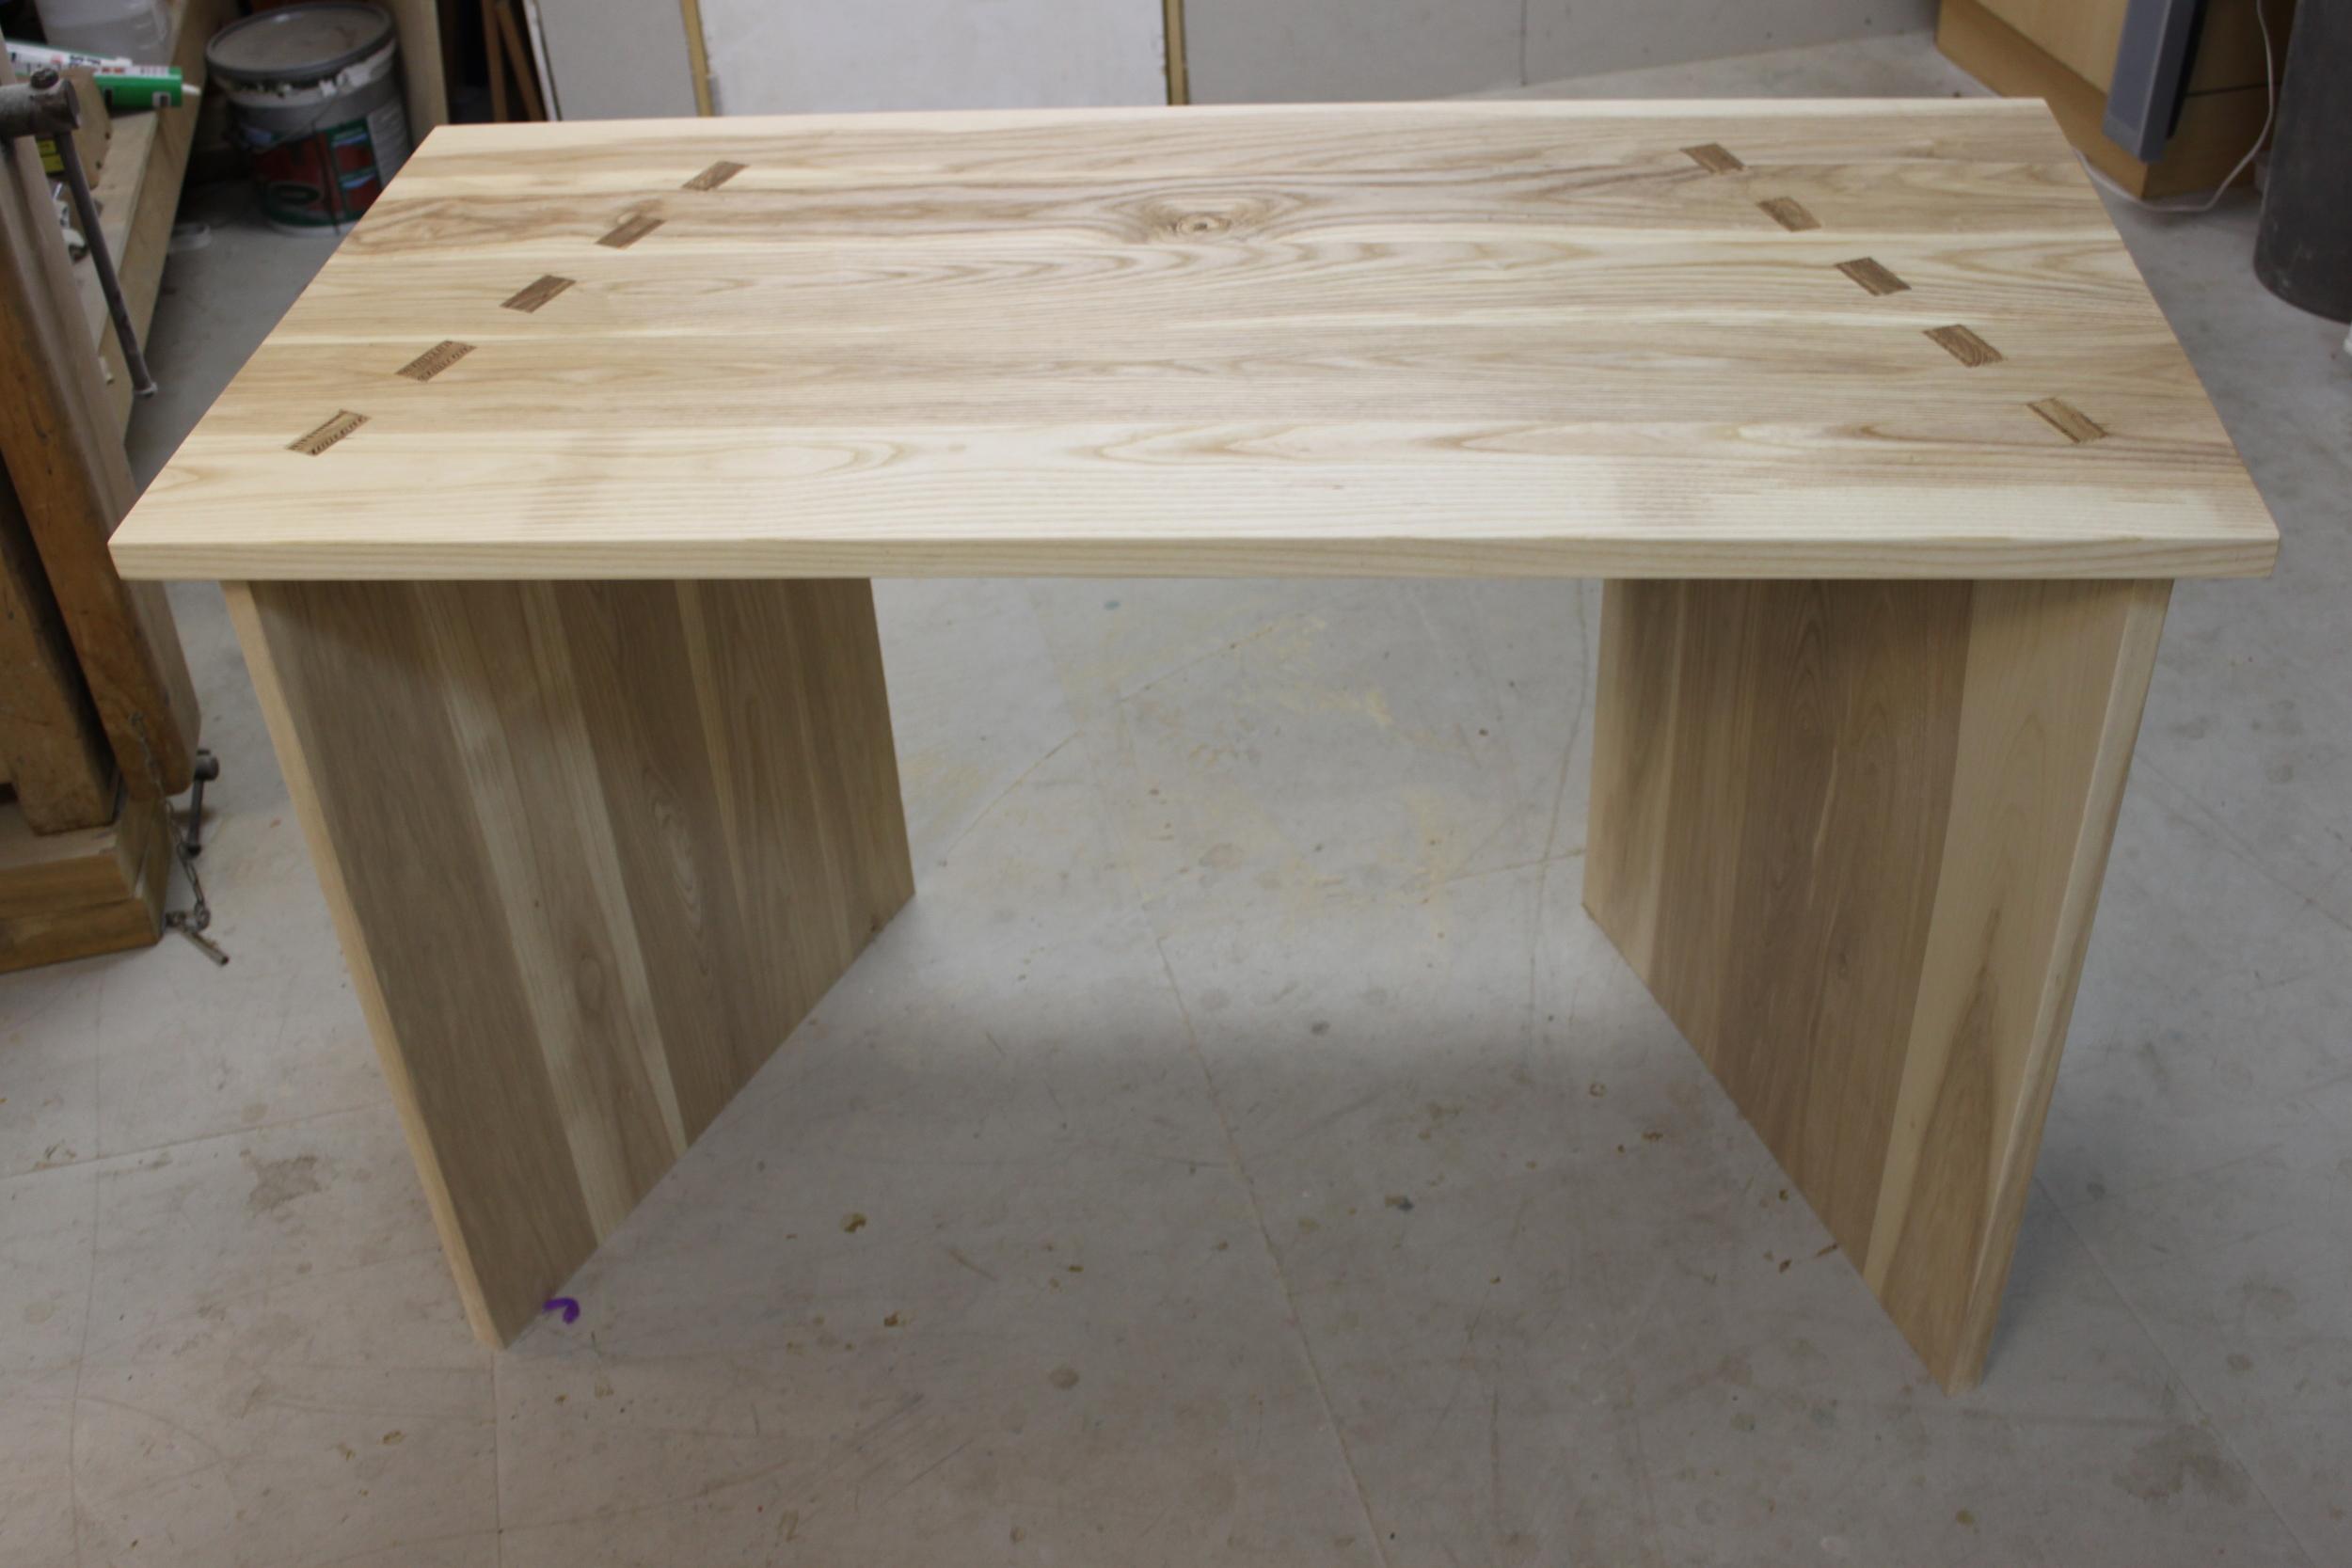 Bespoke desk designed and made on York Art & Crafts Woodwork & Furniture Making Course